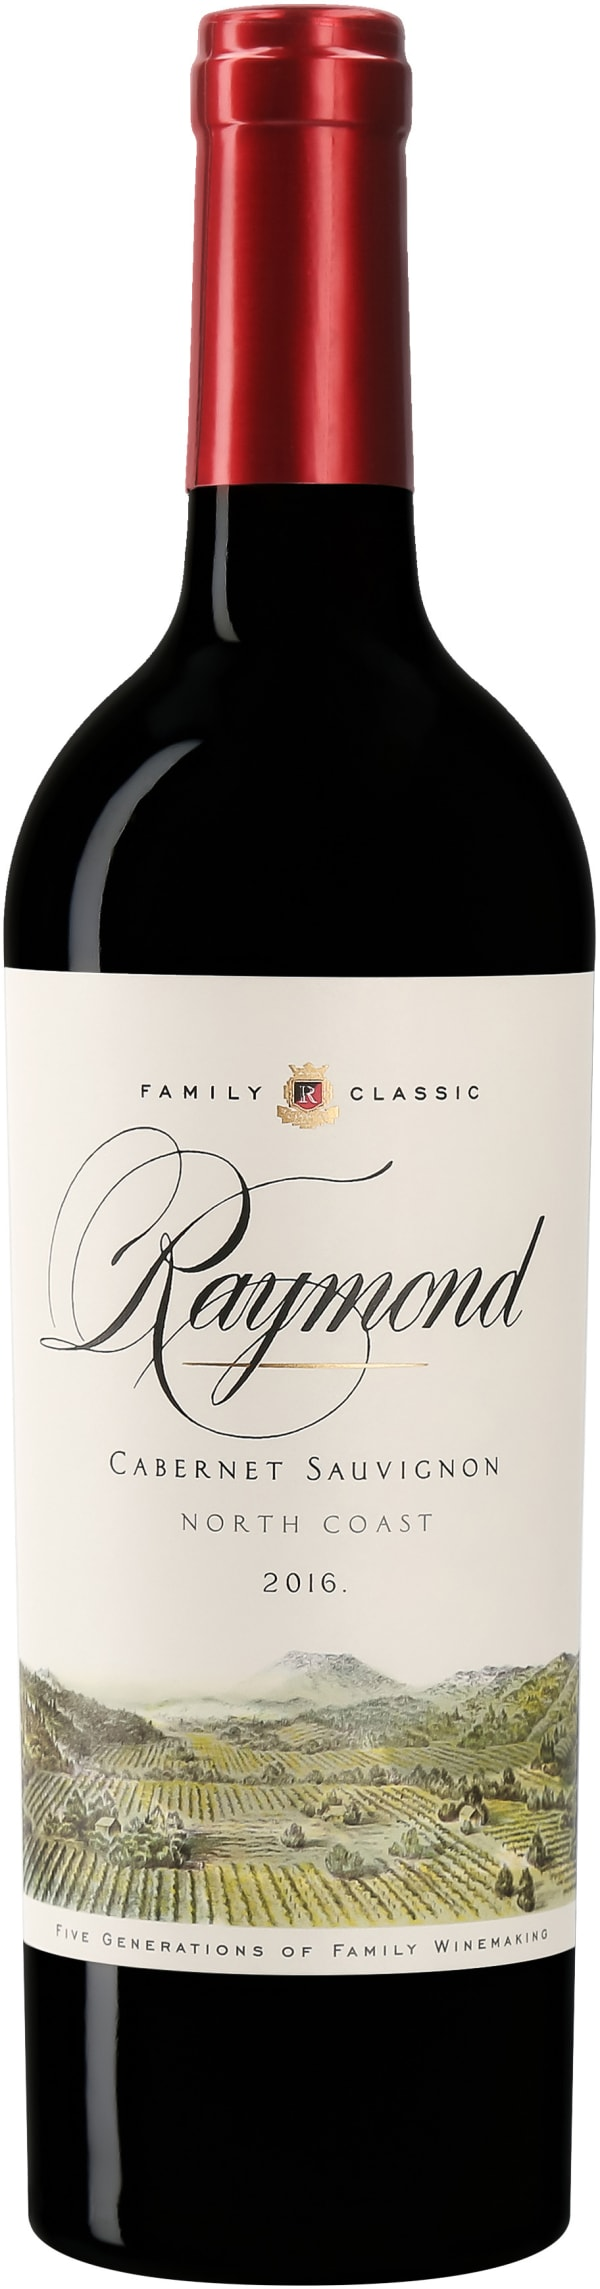 Raymond Family Classic Cabernet Sauvignon 2016